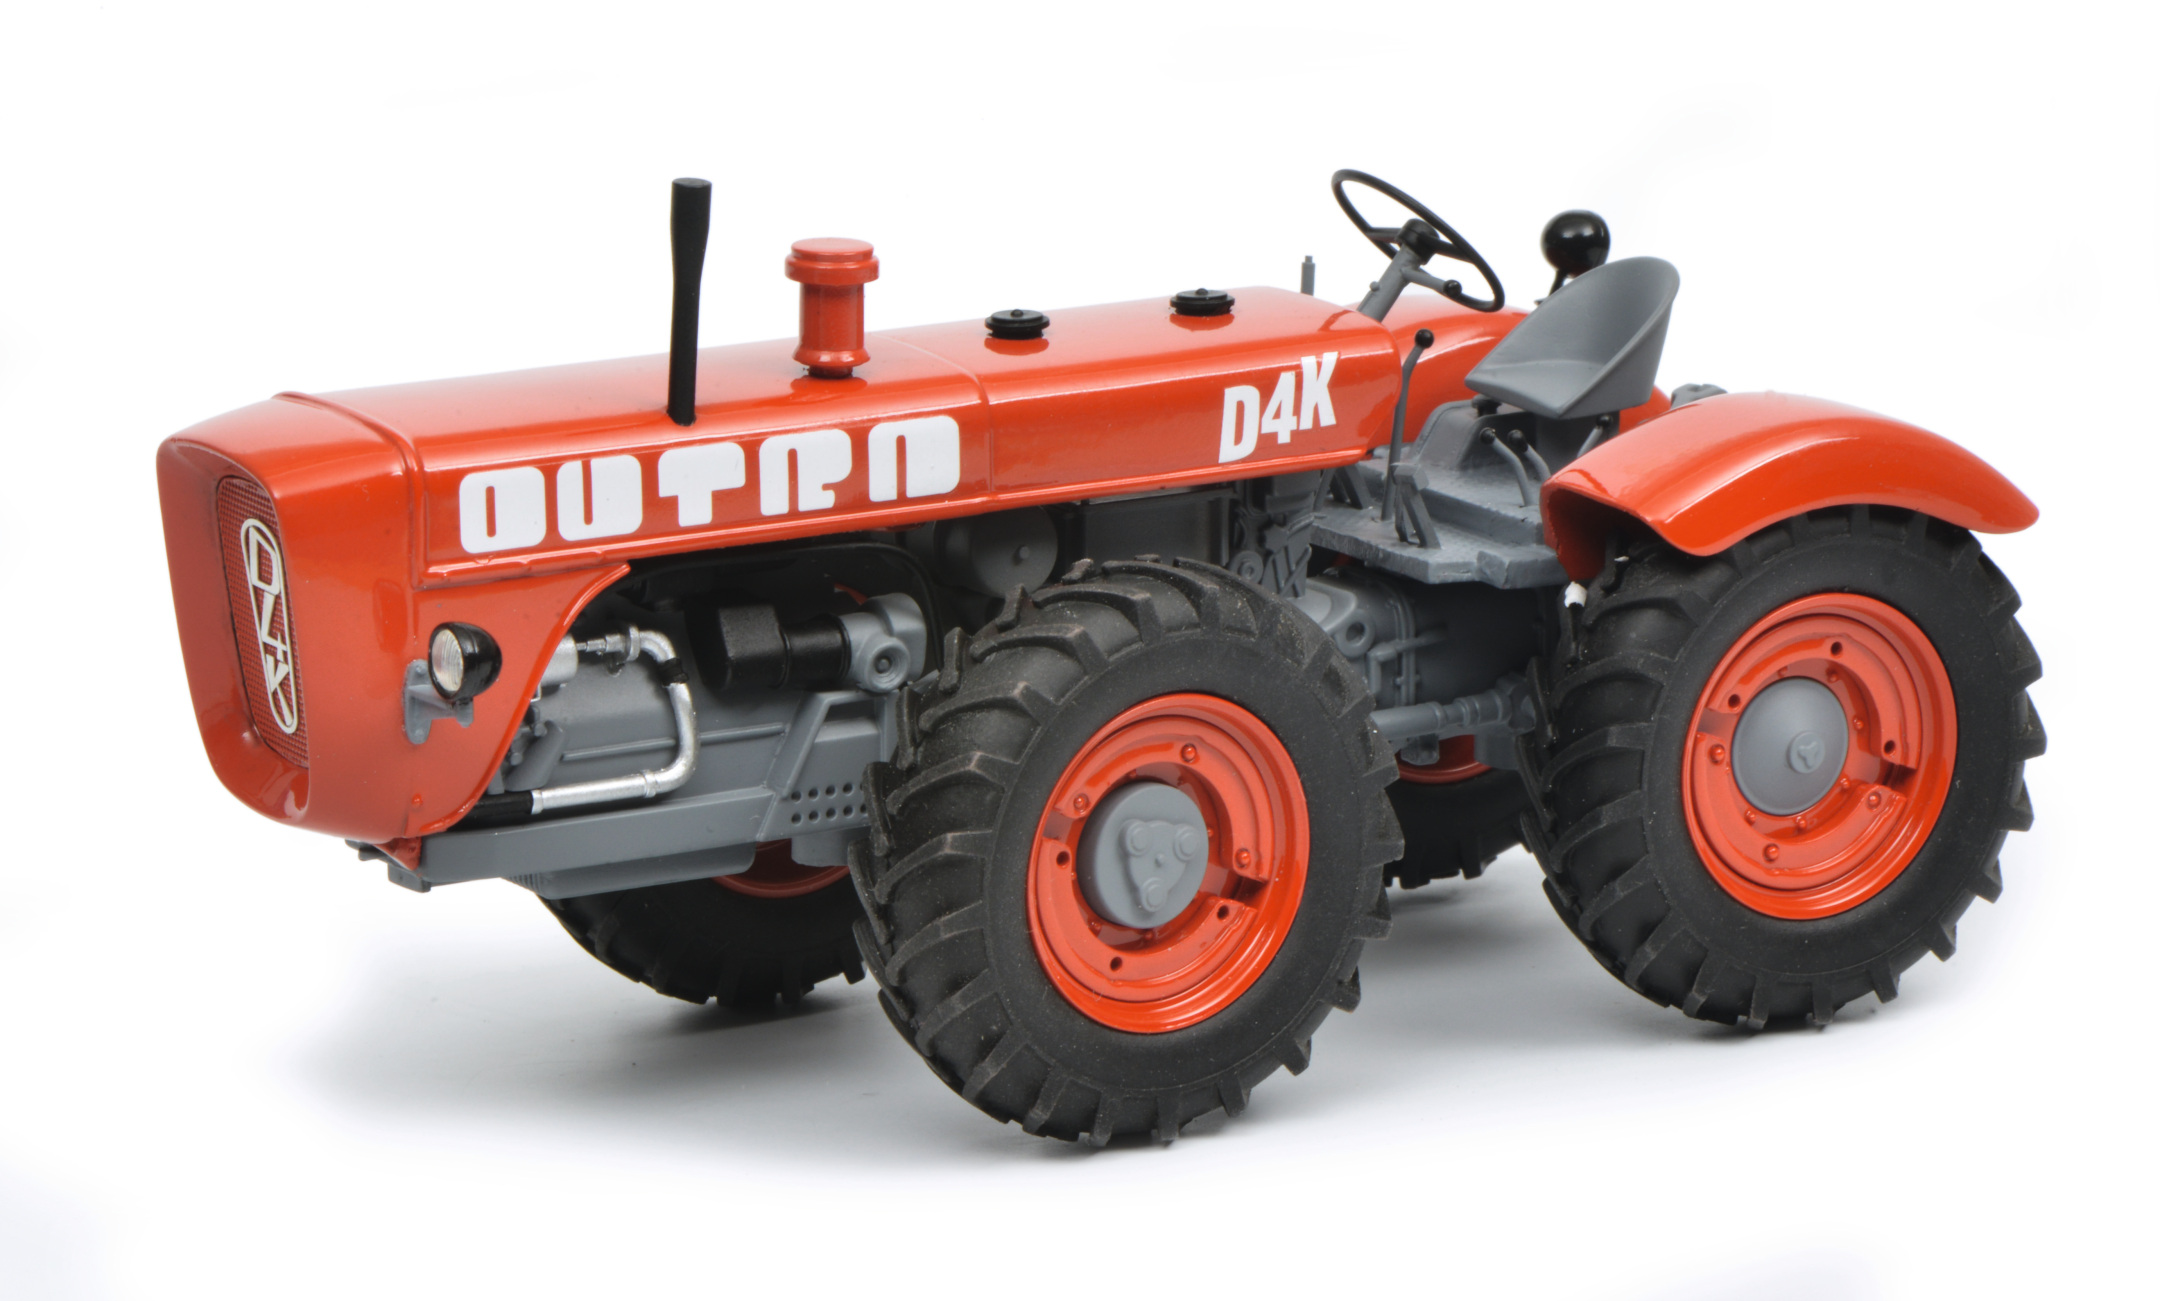 DUTRA D4K Traktor 1:32